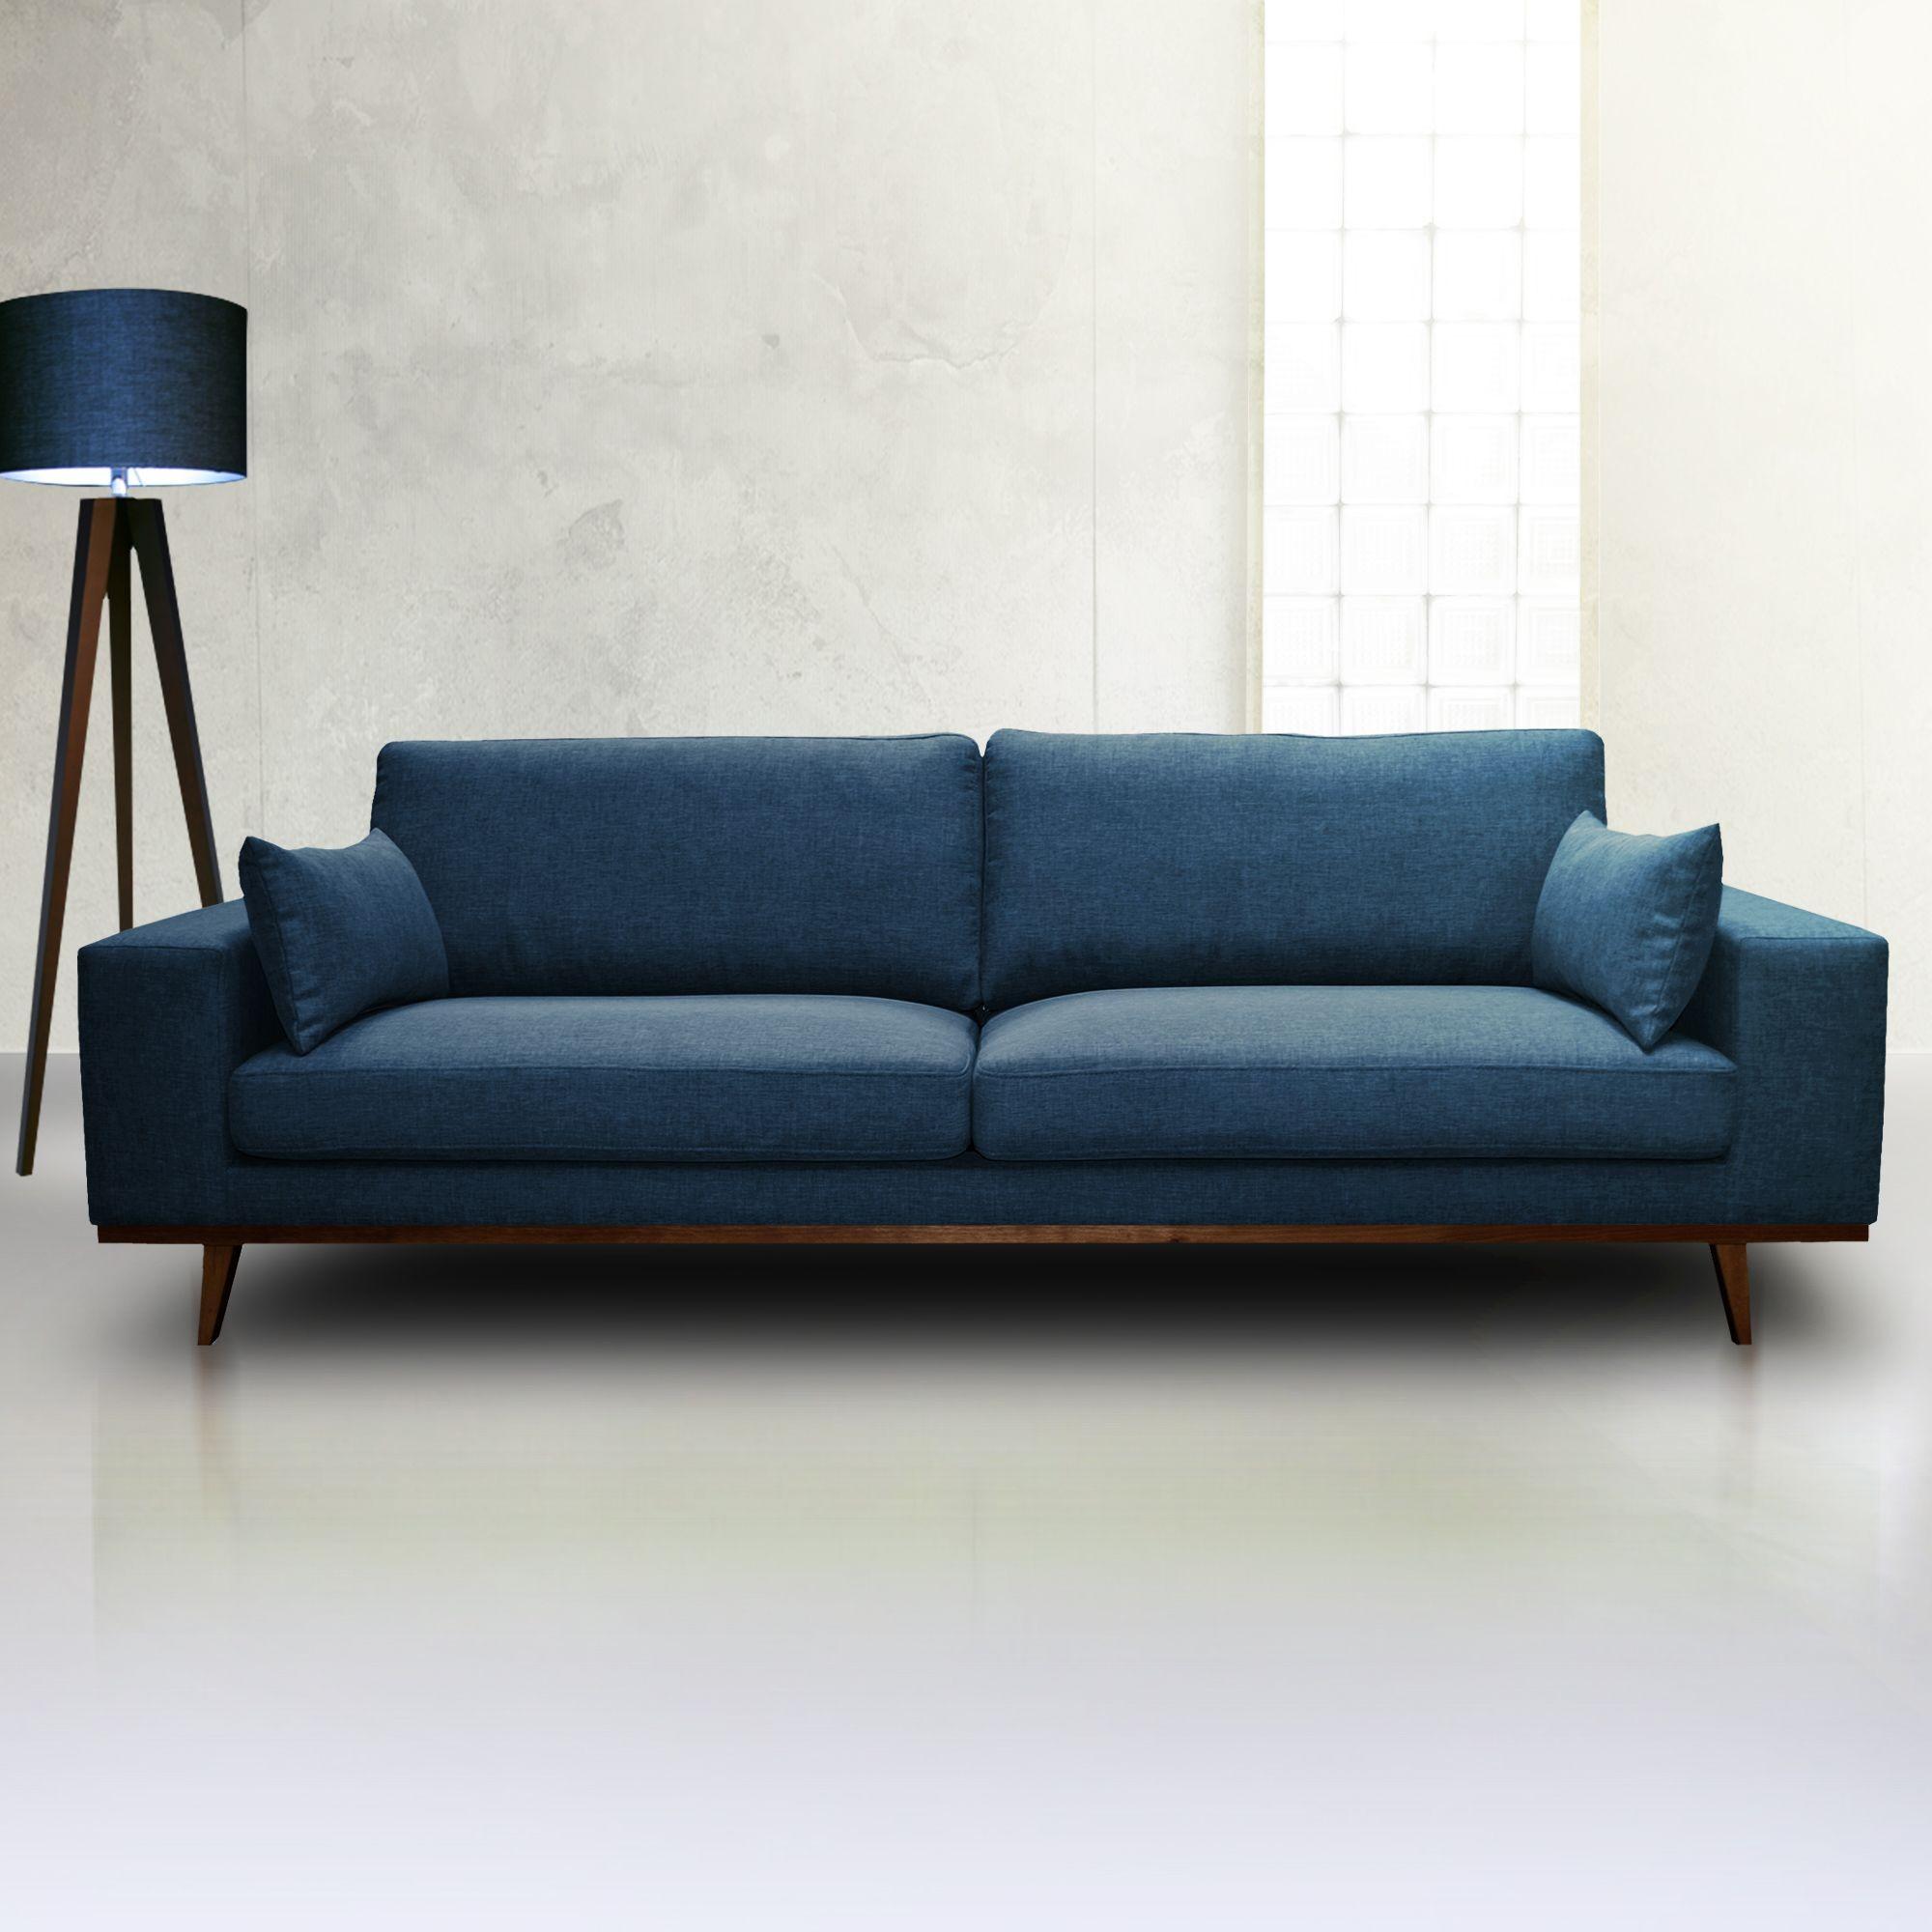 Canapé Convertible Ikea Occasion Beau Galerie Lit Armoire Canapé Beautiful Canap En U Convertible 12 Full Canape D